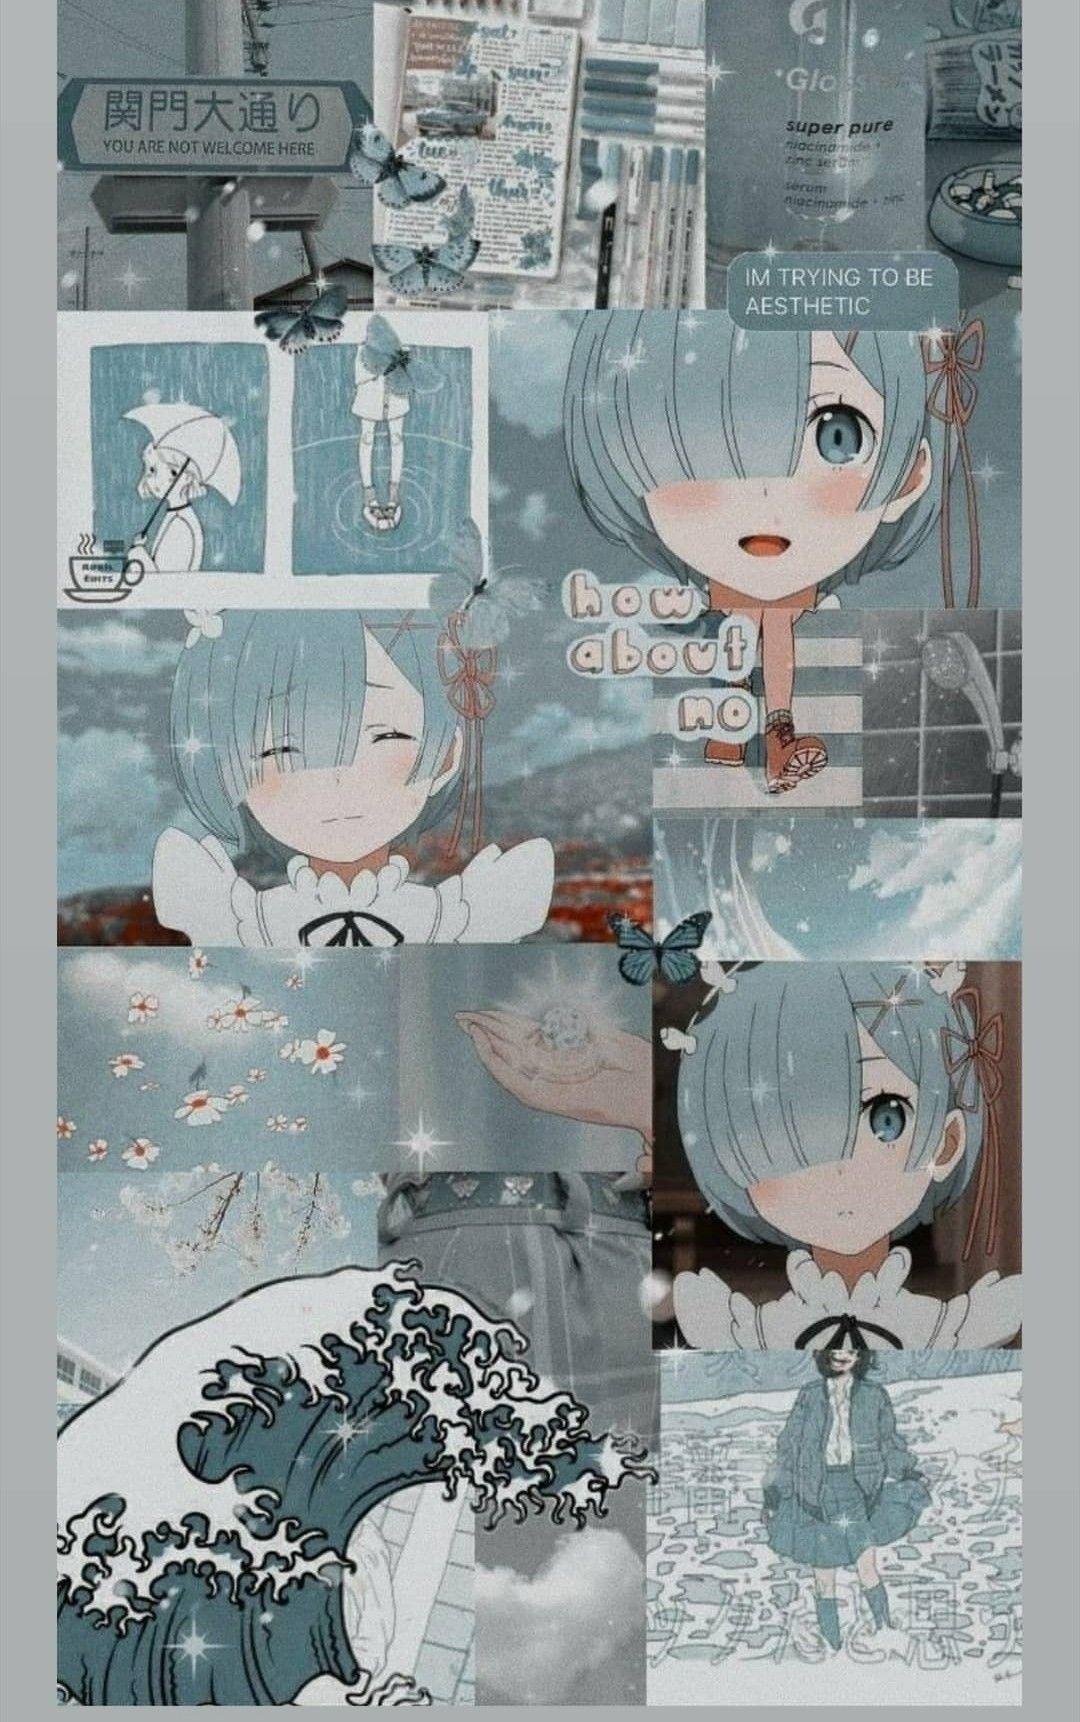 Pin By Iritme On Rezero In 2020 Anime Wallpaper Cute Anime Wallpaper Anime Backgrounds Wallpapers